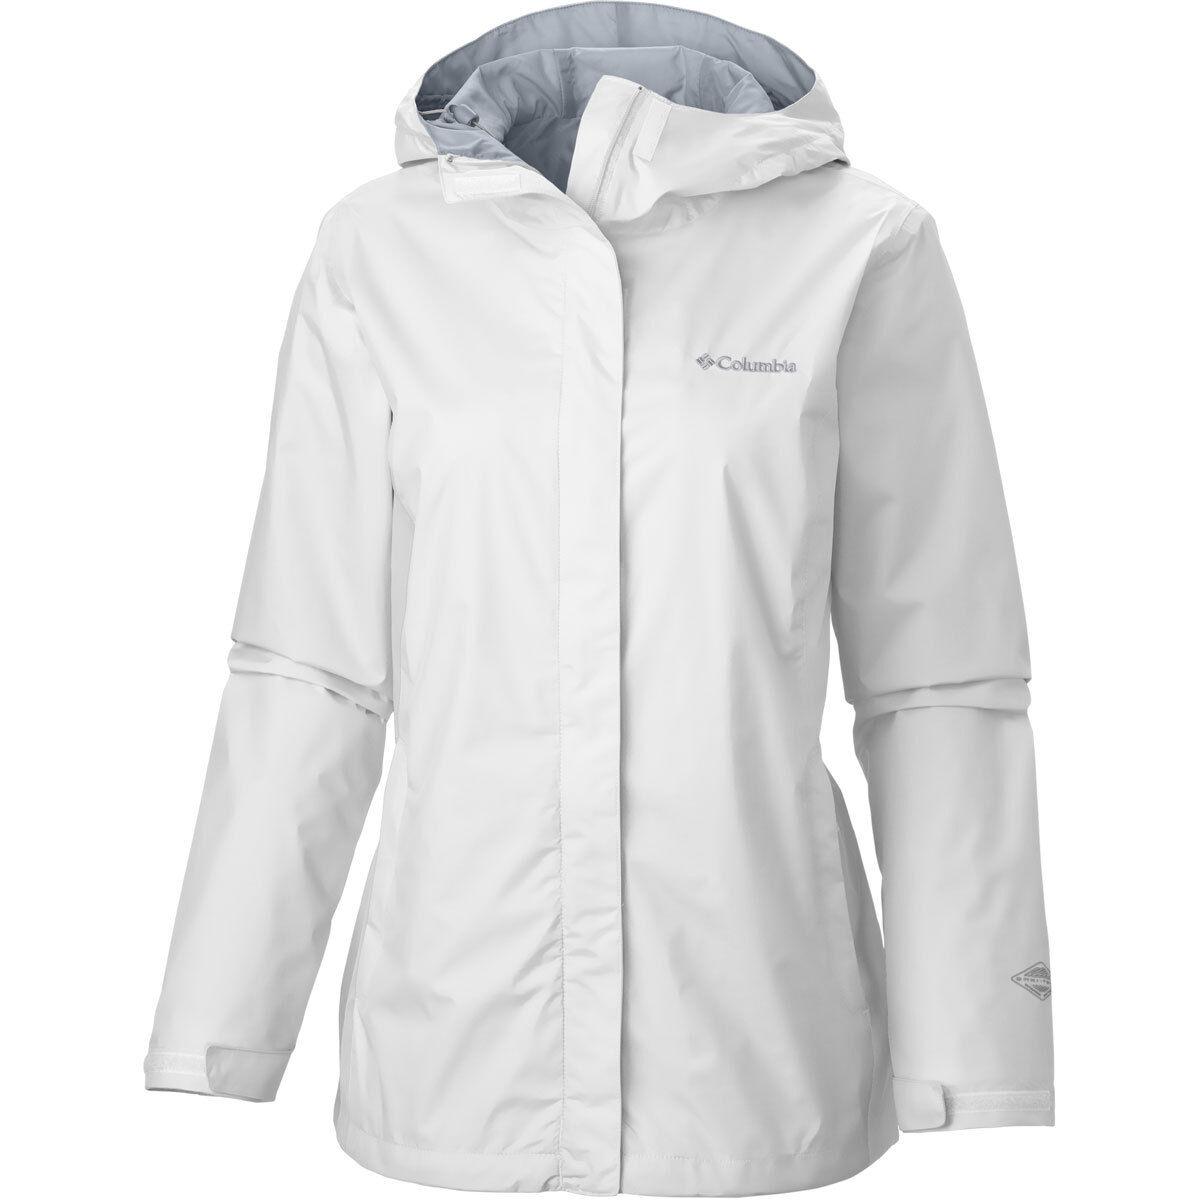 Columbia Arcadia II Rain Jacket Women's 1X  Hooded White/